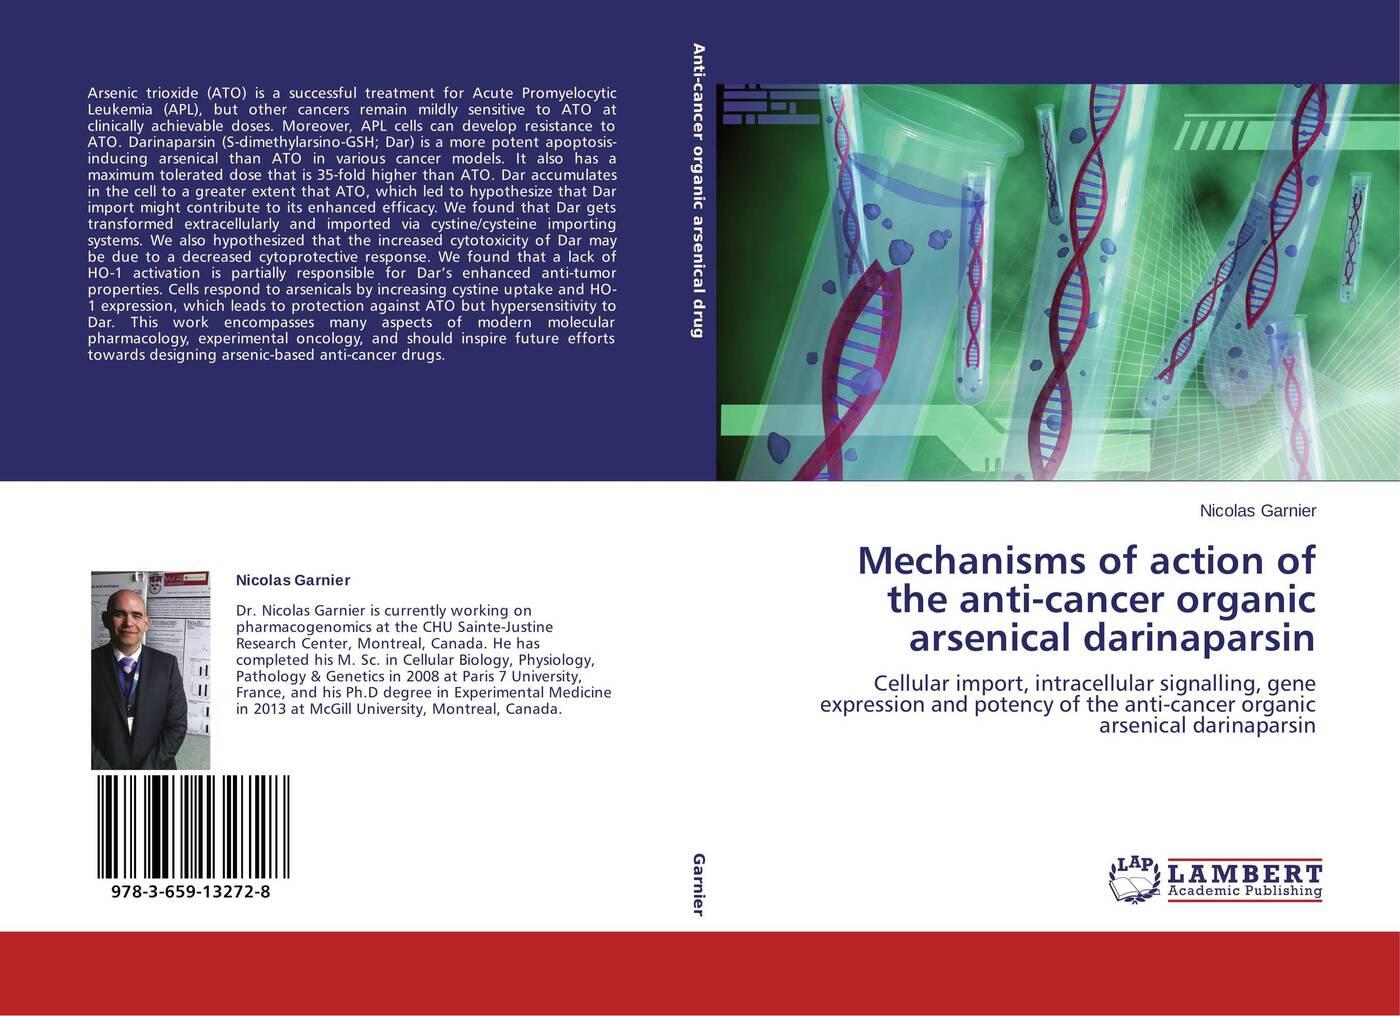 Nicolas Garnier Mechanisms of action of the anti-cancer organic arsenical darinaparsin